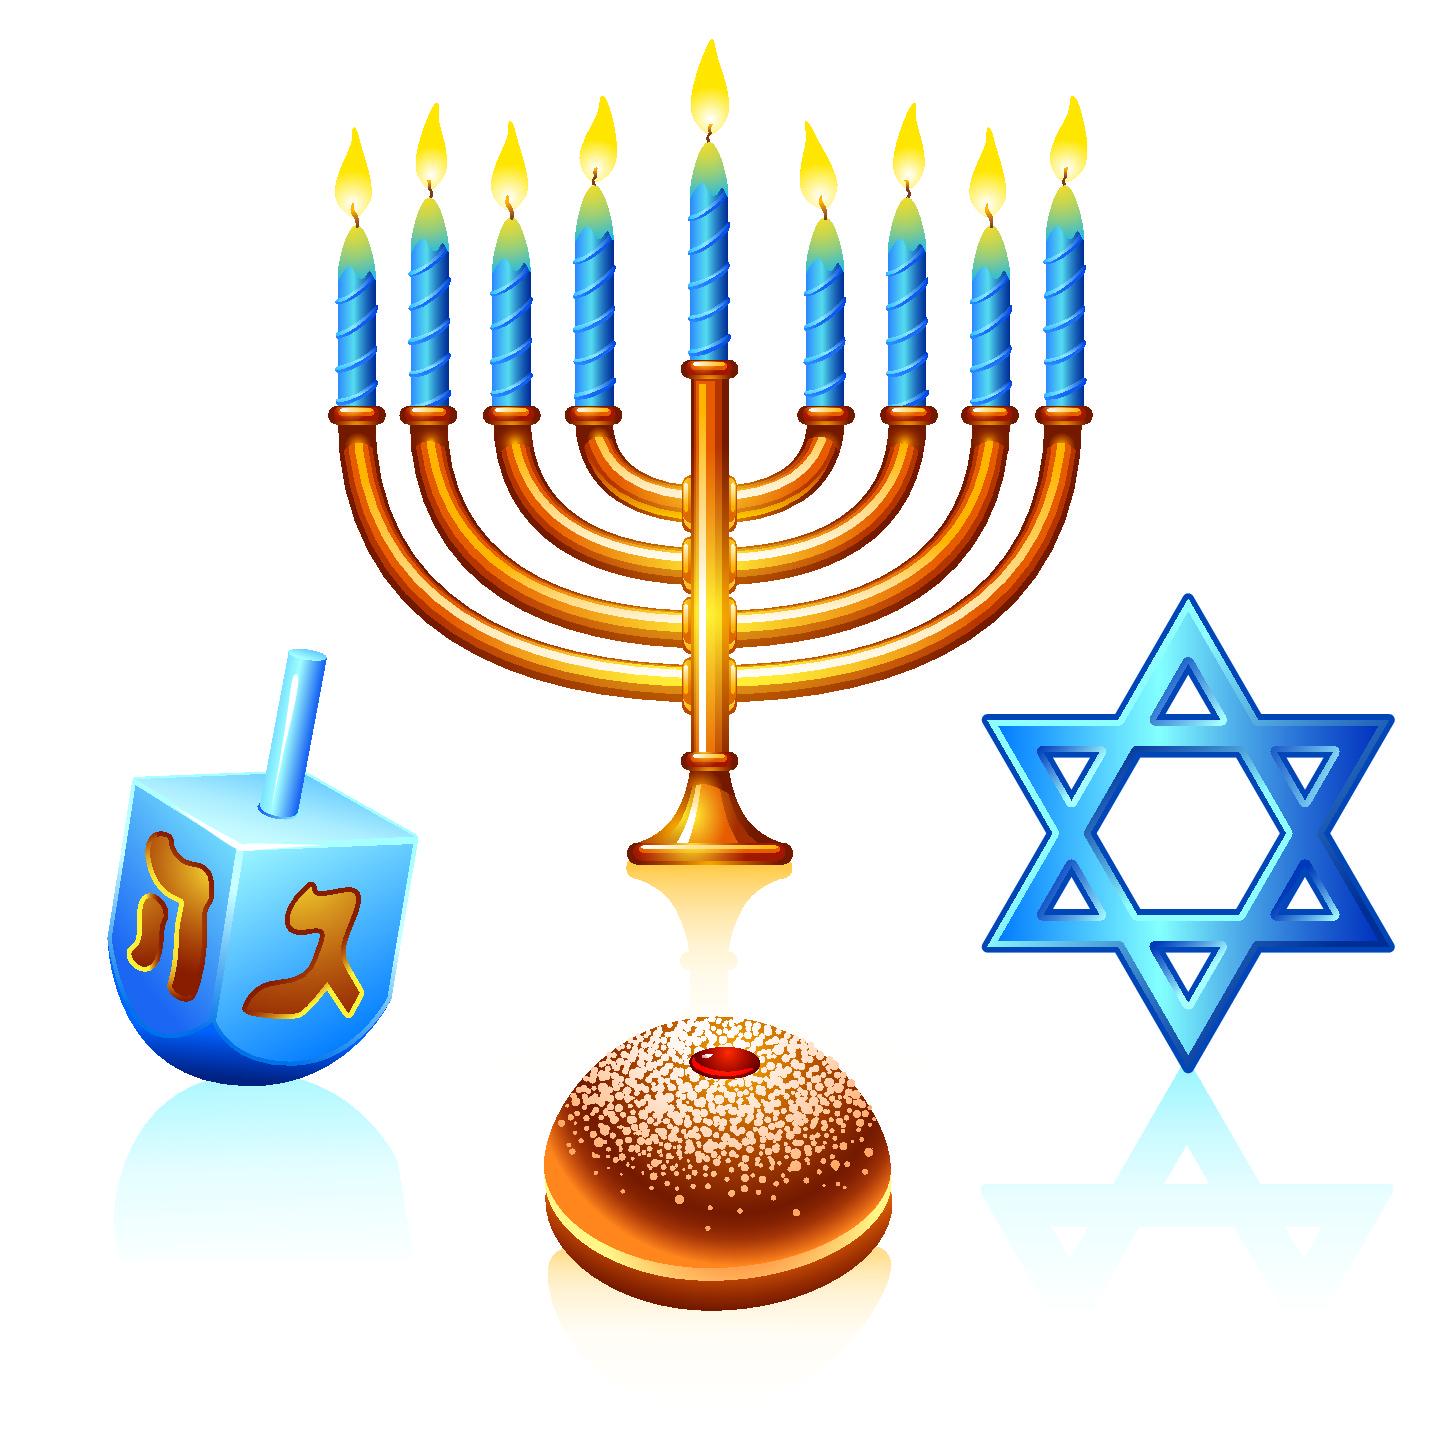 Jewish holiday symbols clipart vector black and white Jewish Menorah Clipart | Free download best Jewish Menorah Clipart ... vector black and white